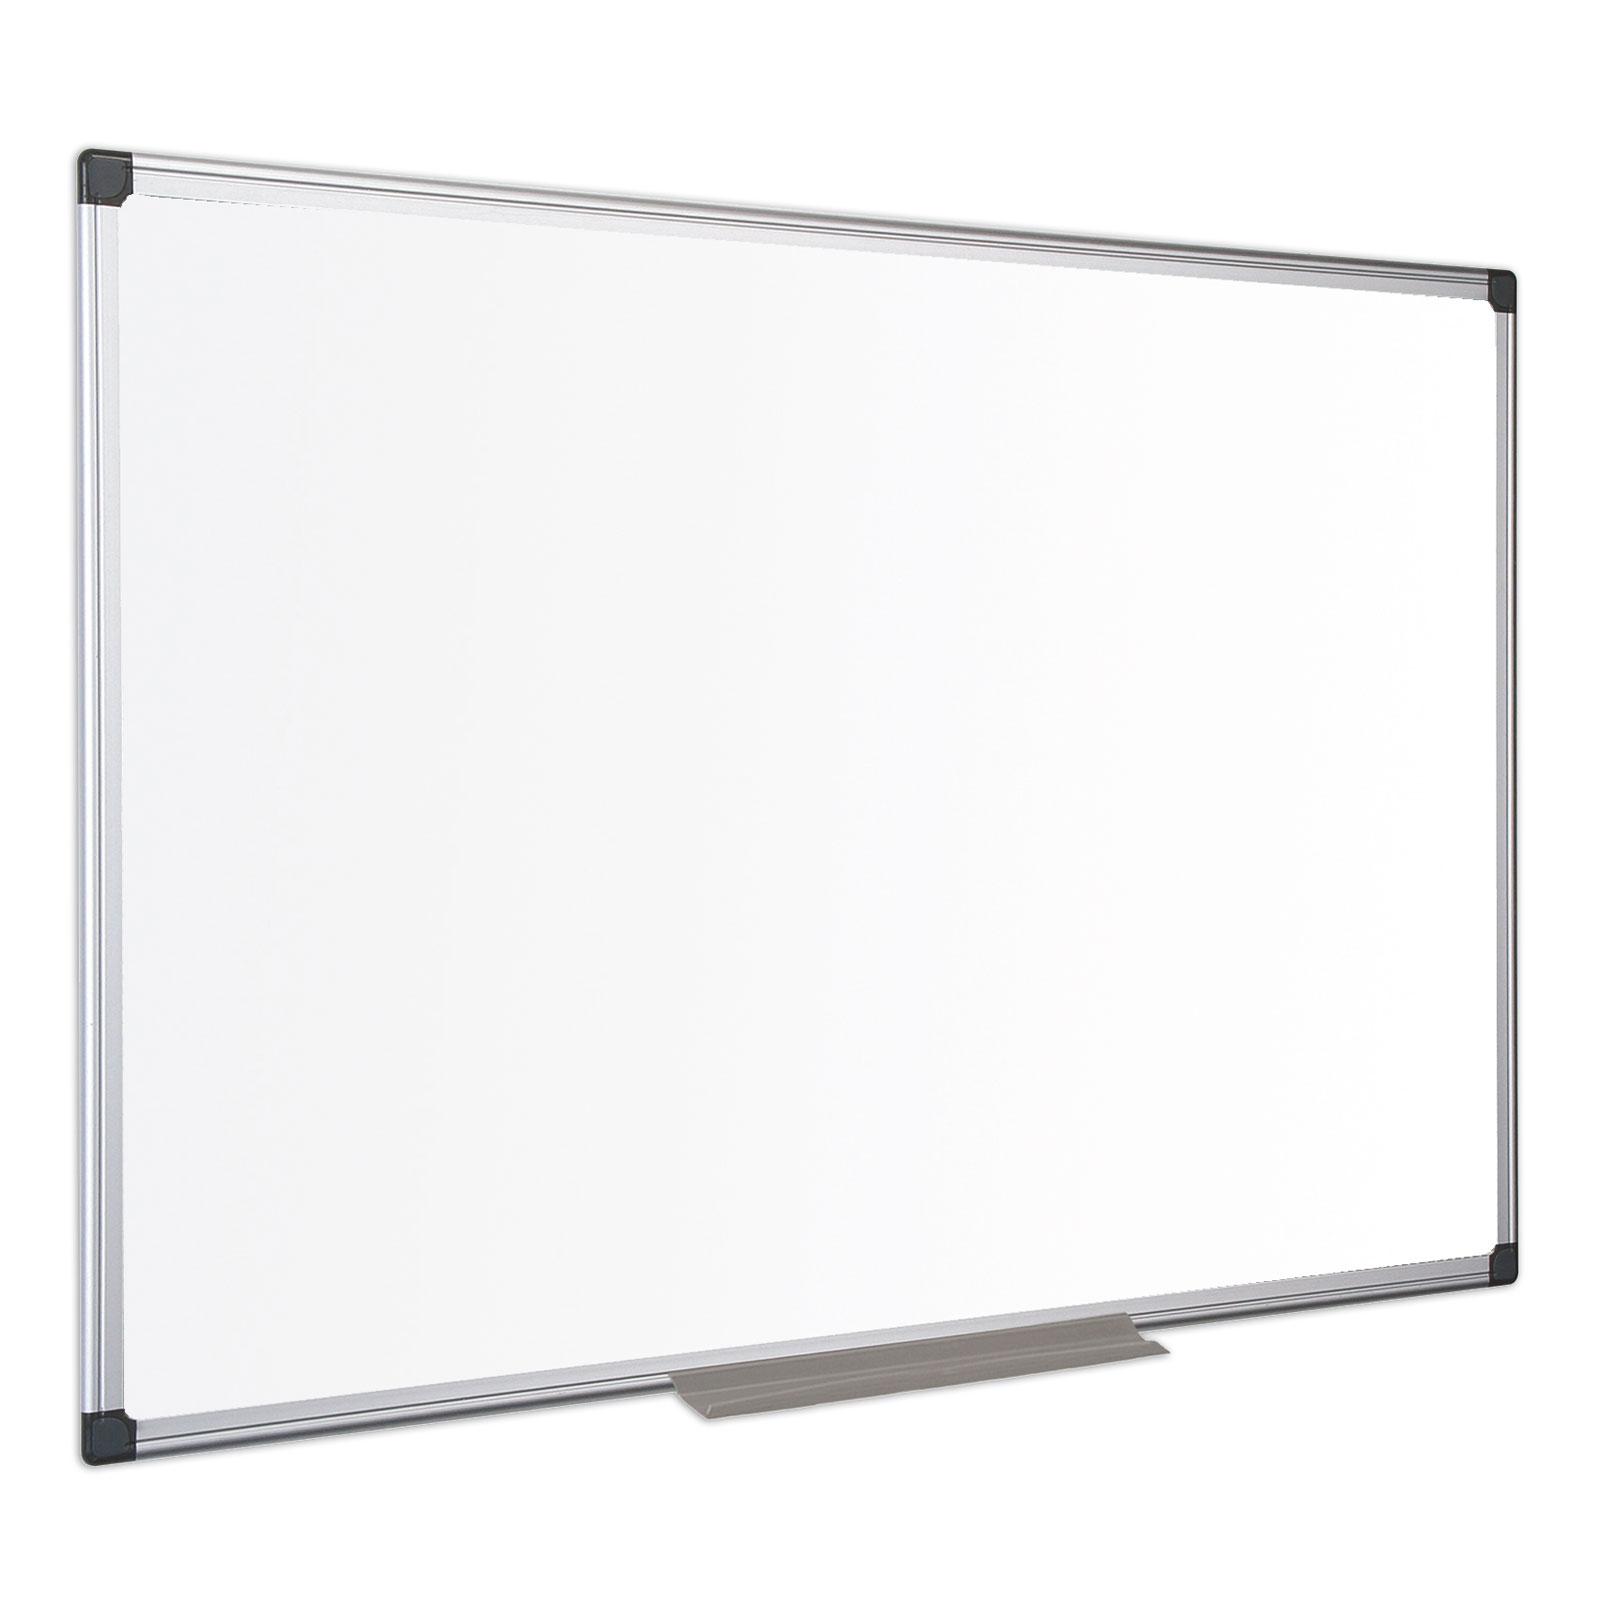 bi office tableau blanc laqu 120 x 90 cm tableau blanc. Black Bedroom Furniture Sets. Home Design Ideas